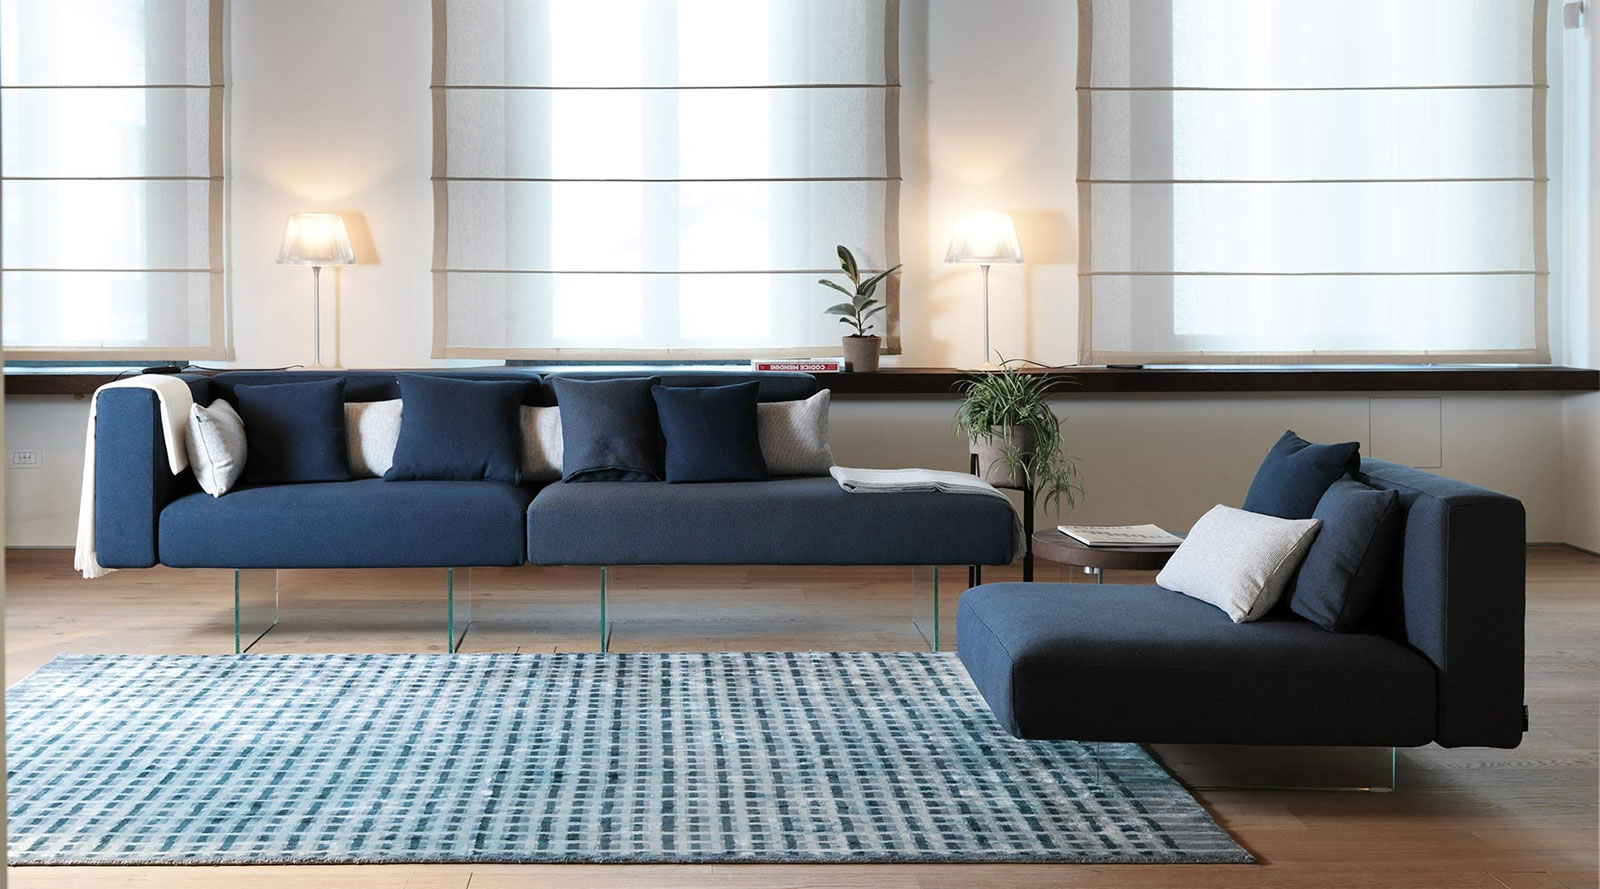 Arredamento Di Design arredamento di design lago e caccaro - showroom piroddi